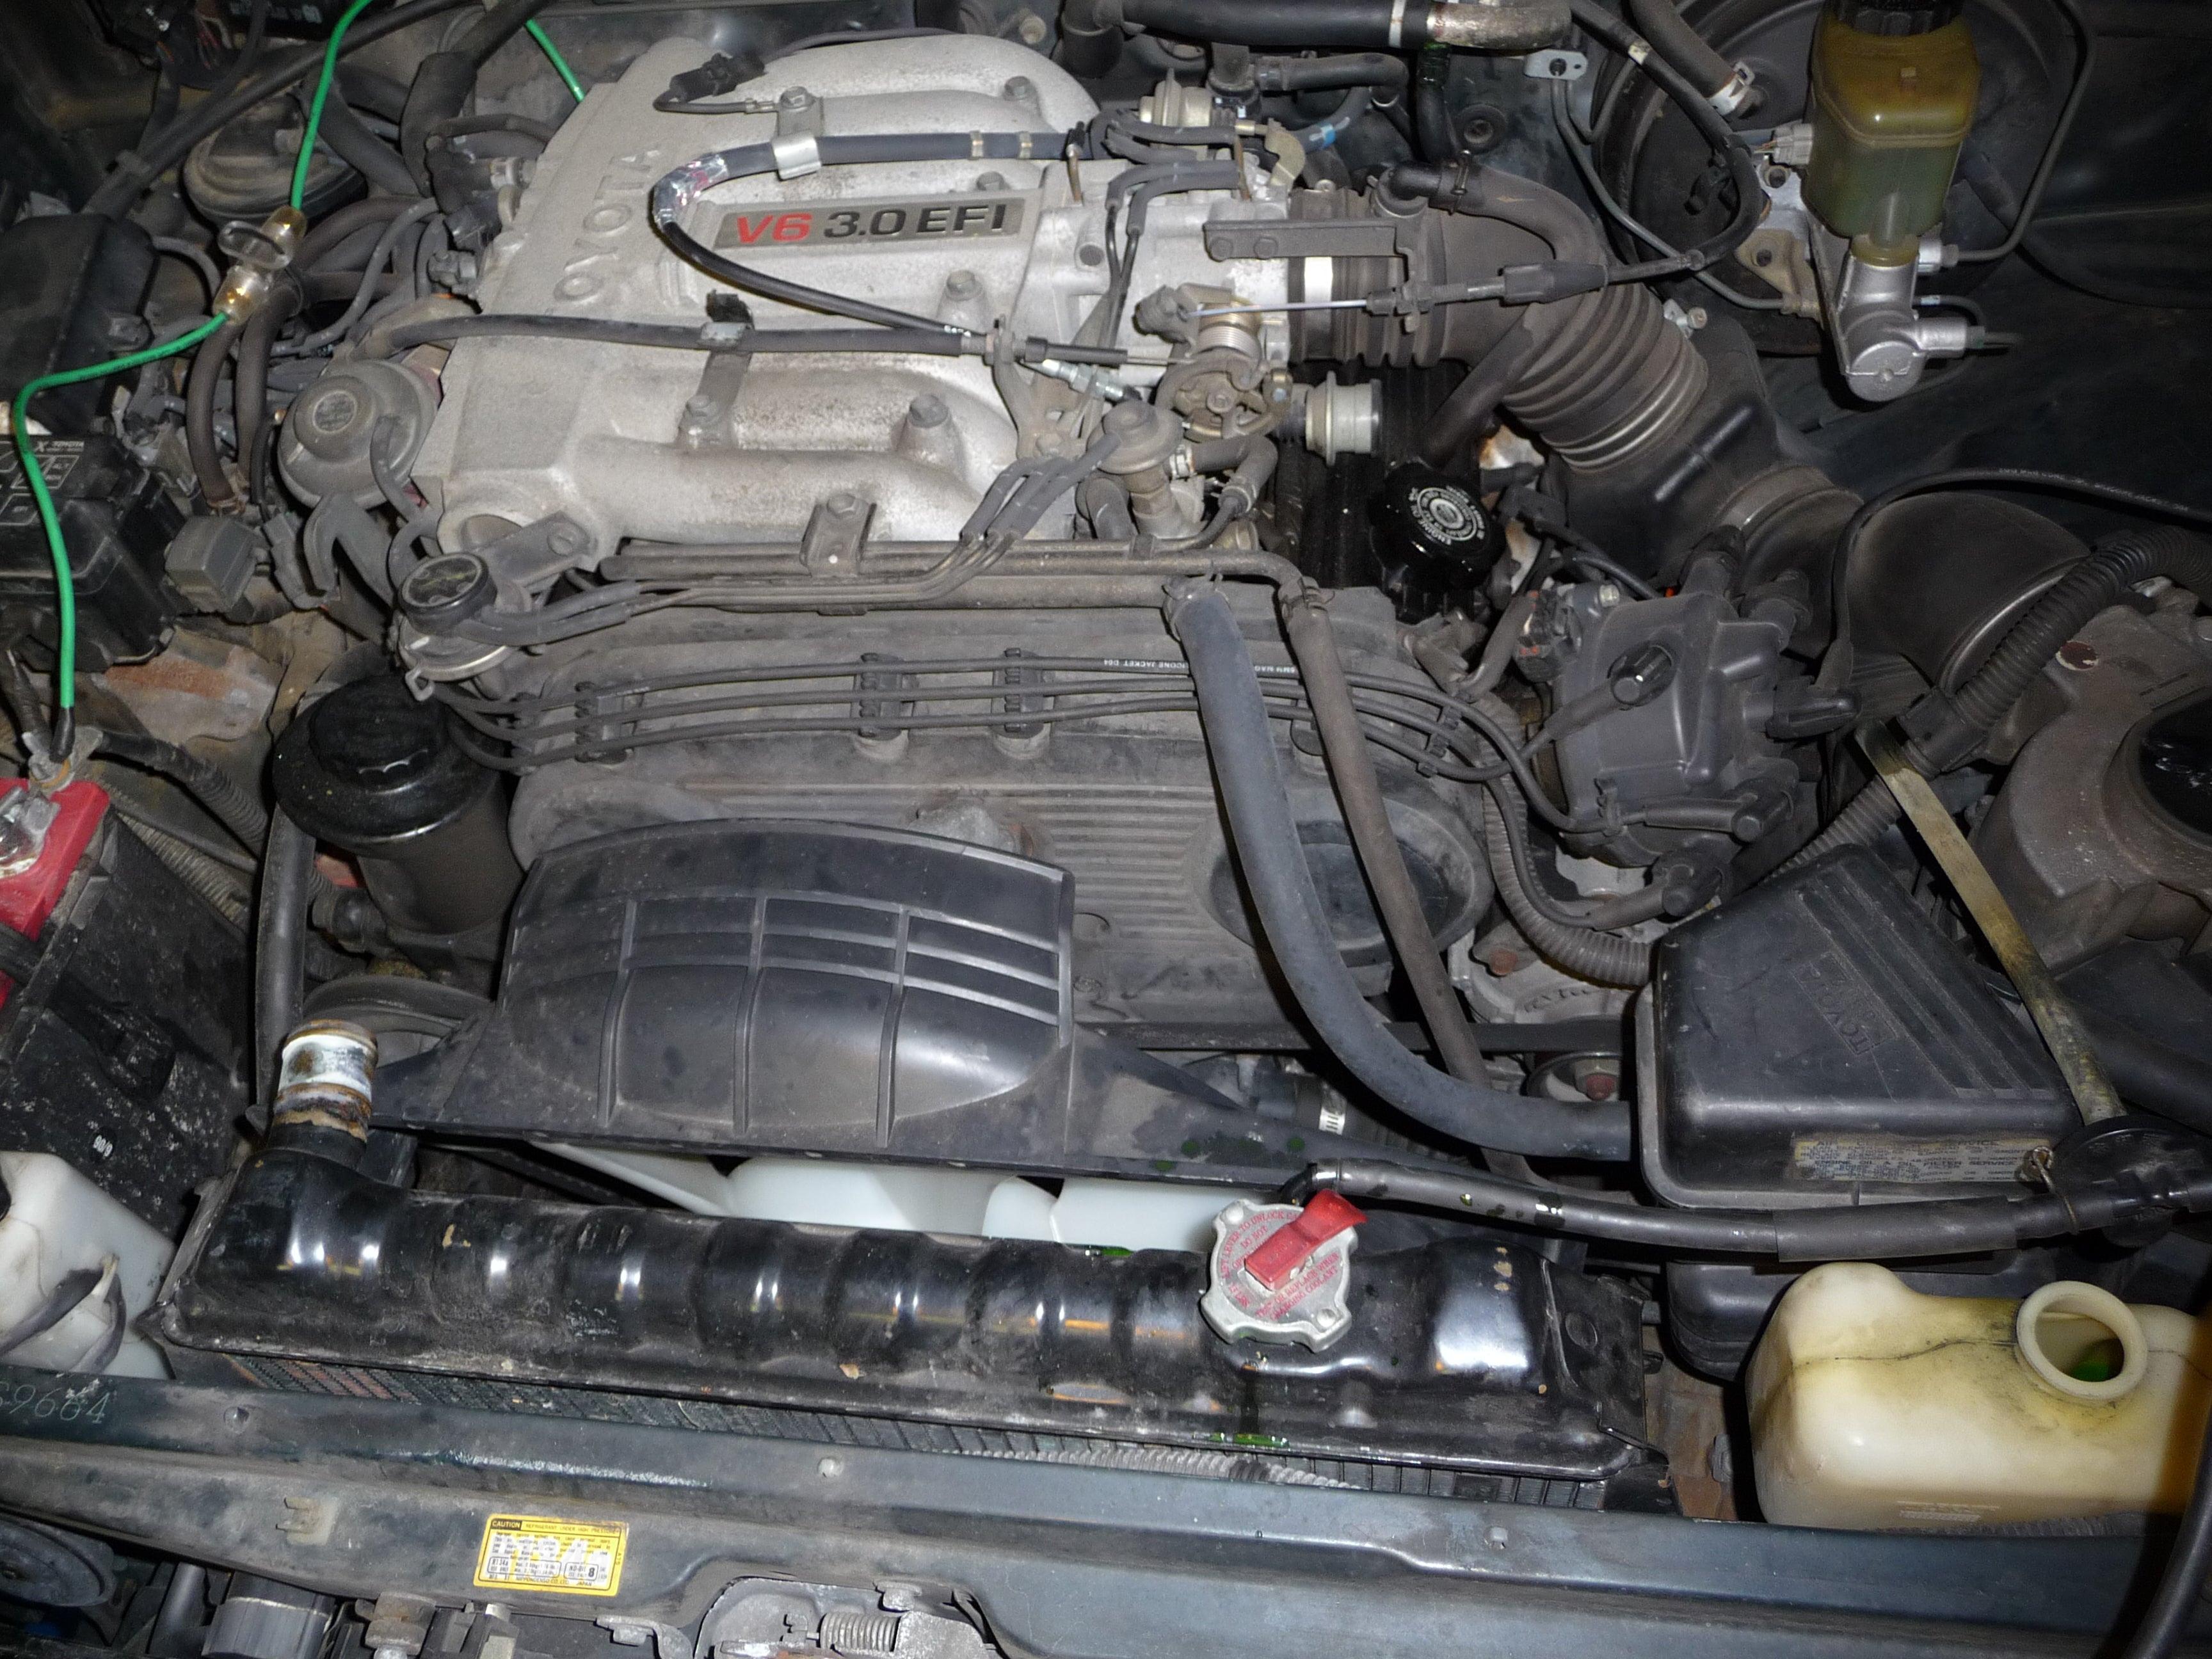 1994 toyota 4runner engine diagram | grouper-concepti wiring diagram number  - grouper-concepti.garbobar.it  garbo bar